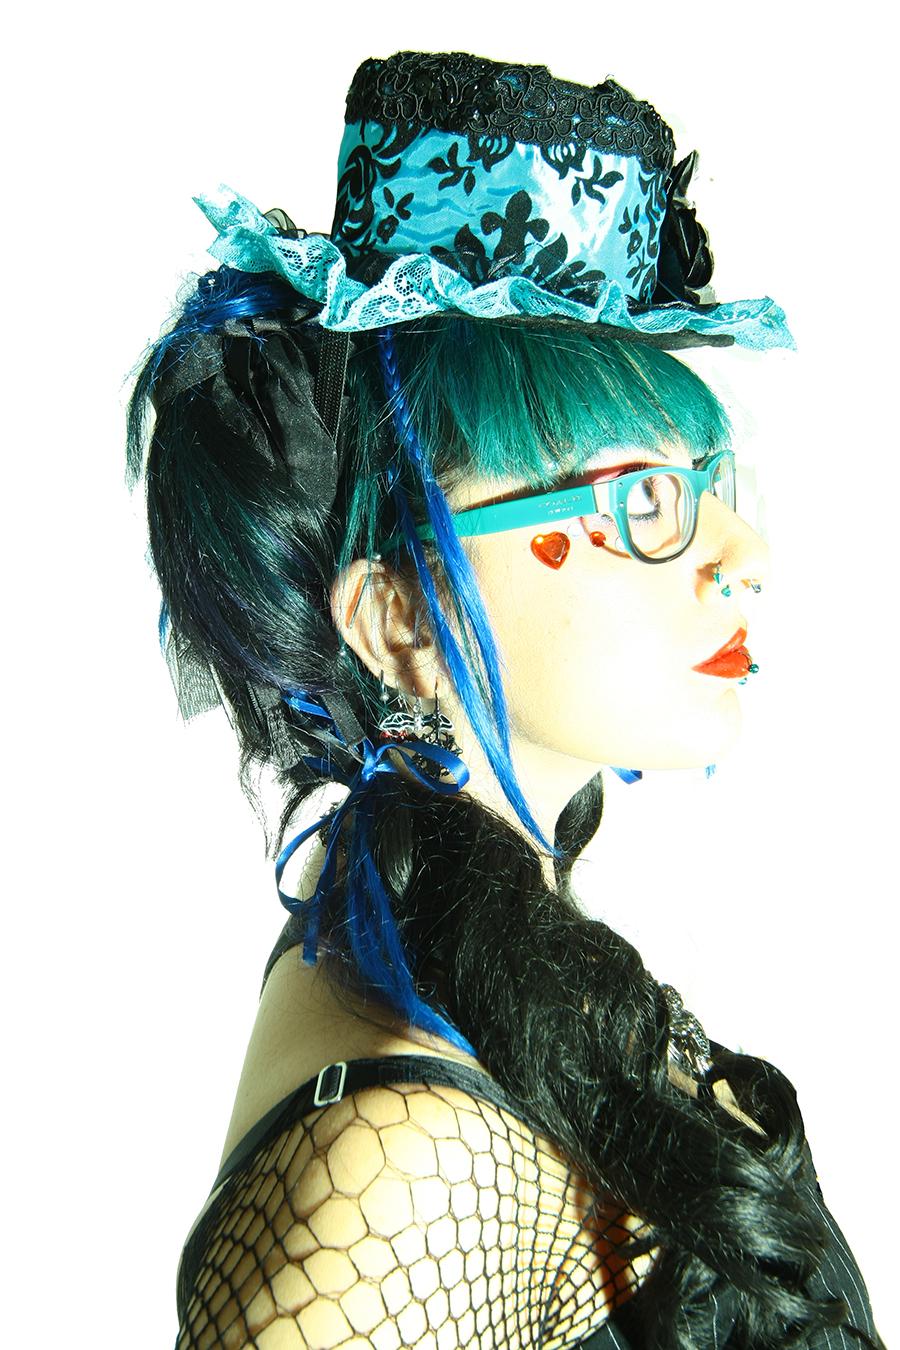 damask_mini_top_hat_light_blue_hats_and_caps_3.jpg